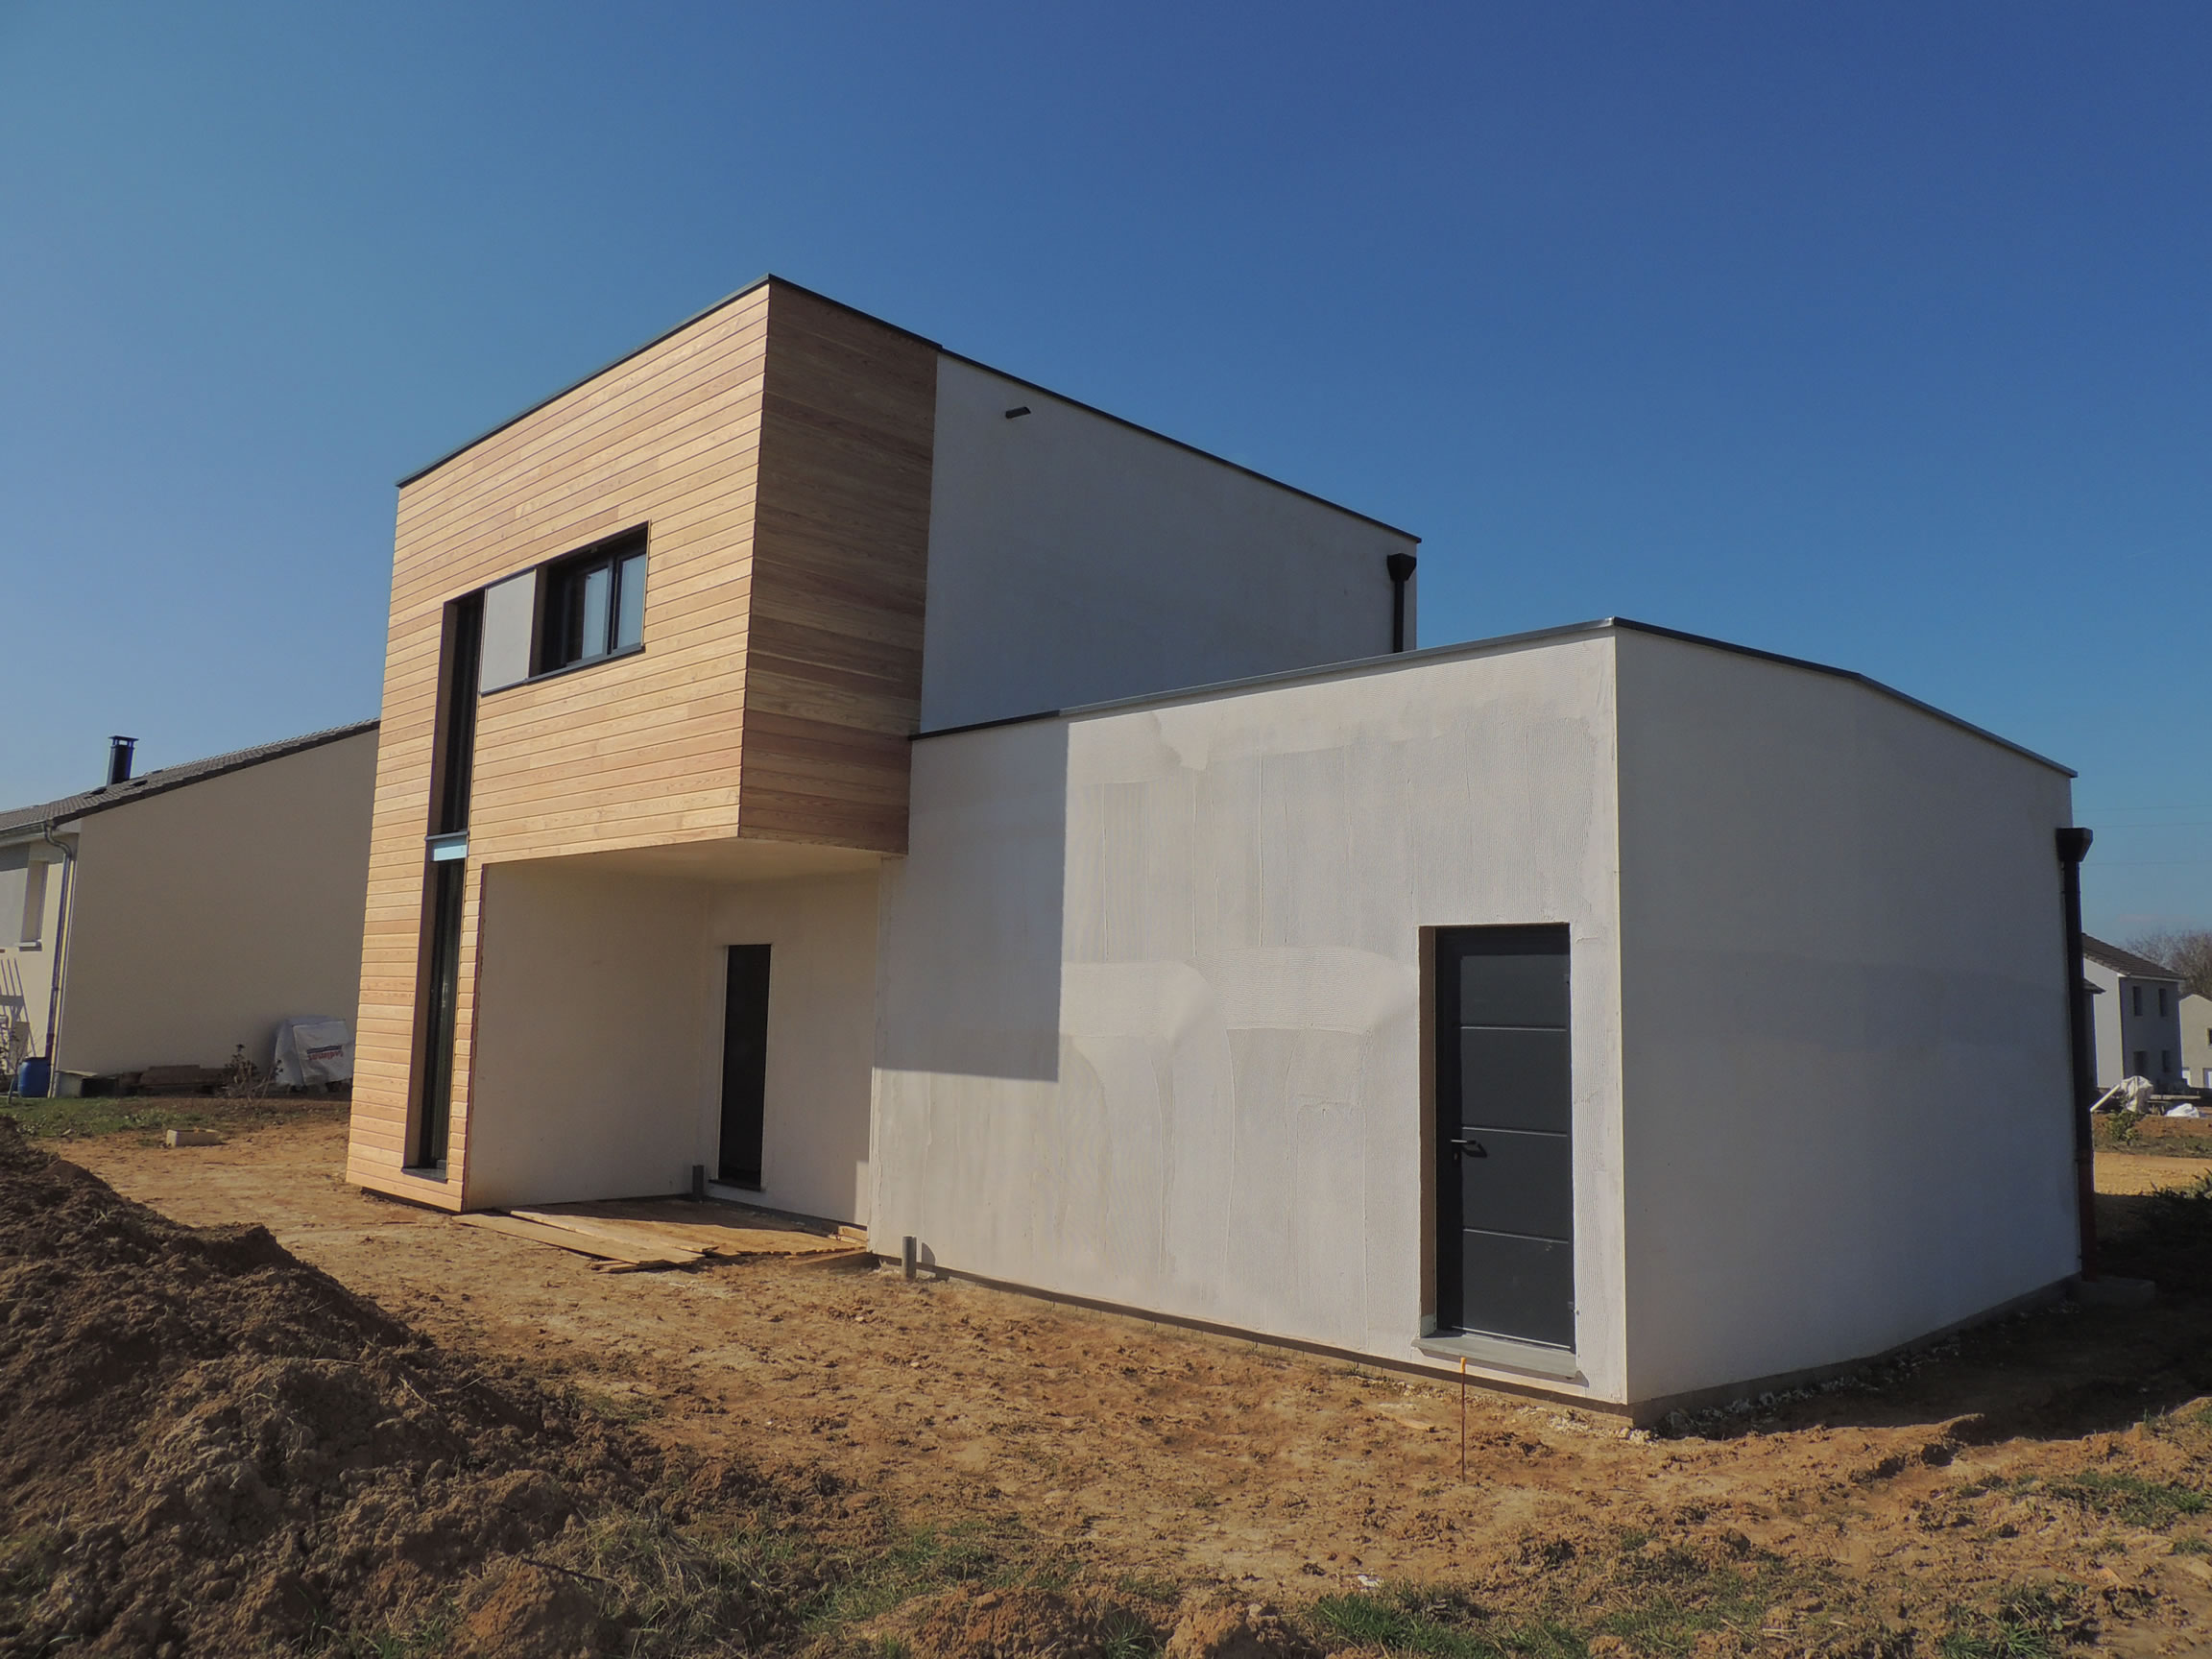 Petite Hettange R+1 145m2 Maison ossature bois # Petite Maison Ossature Bois